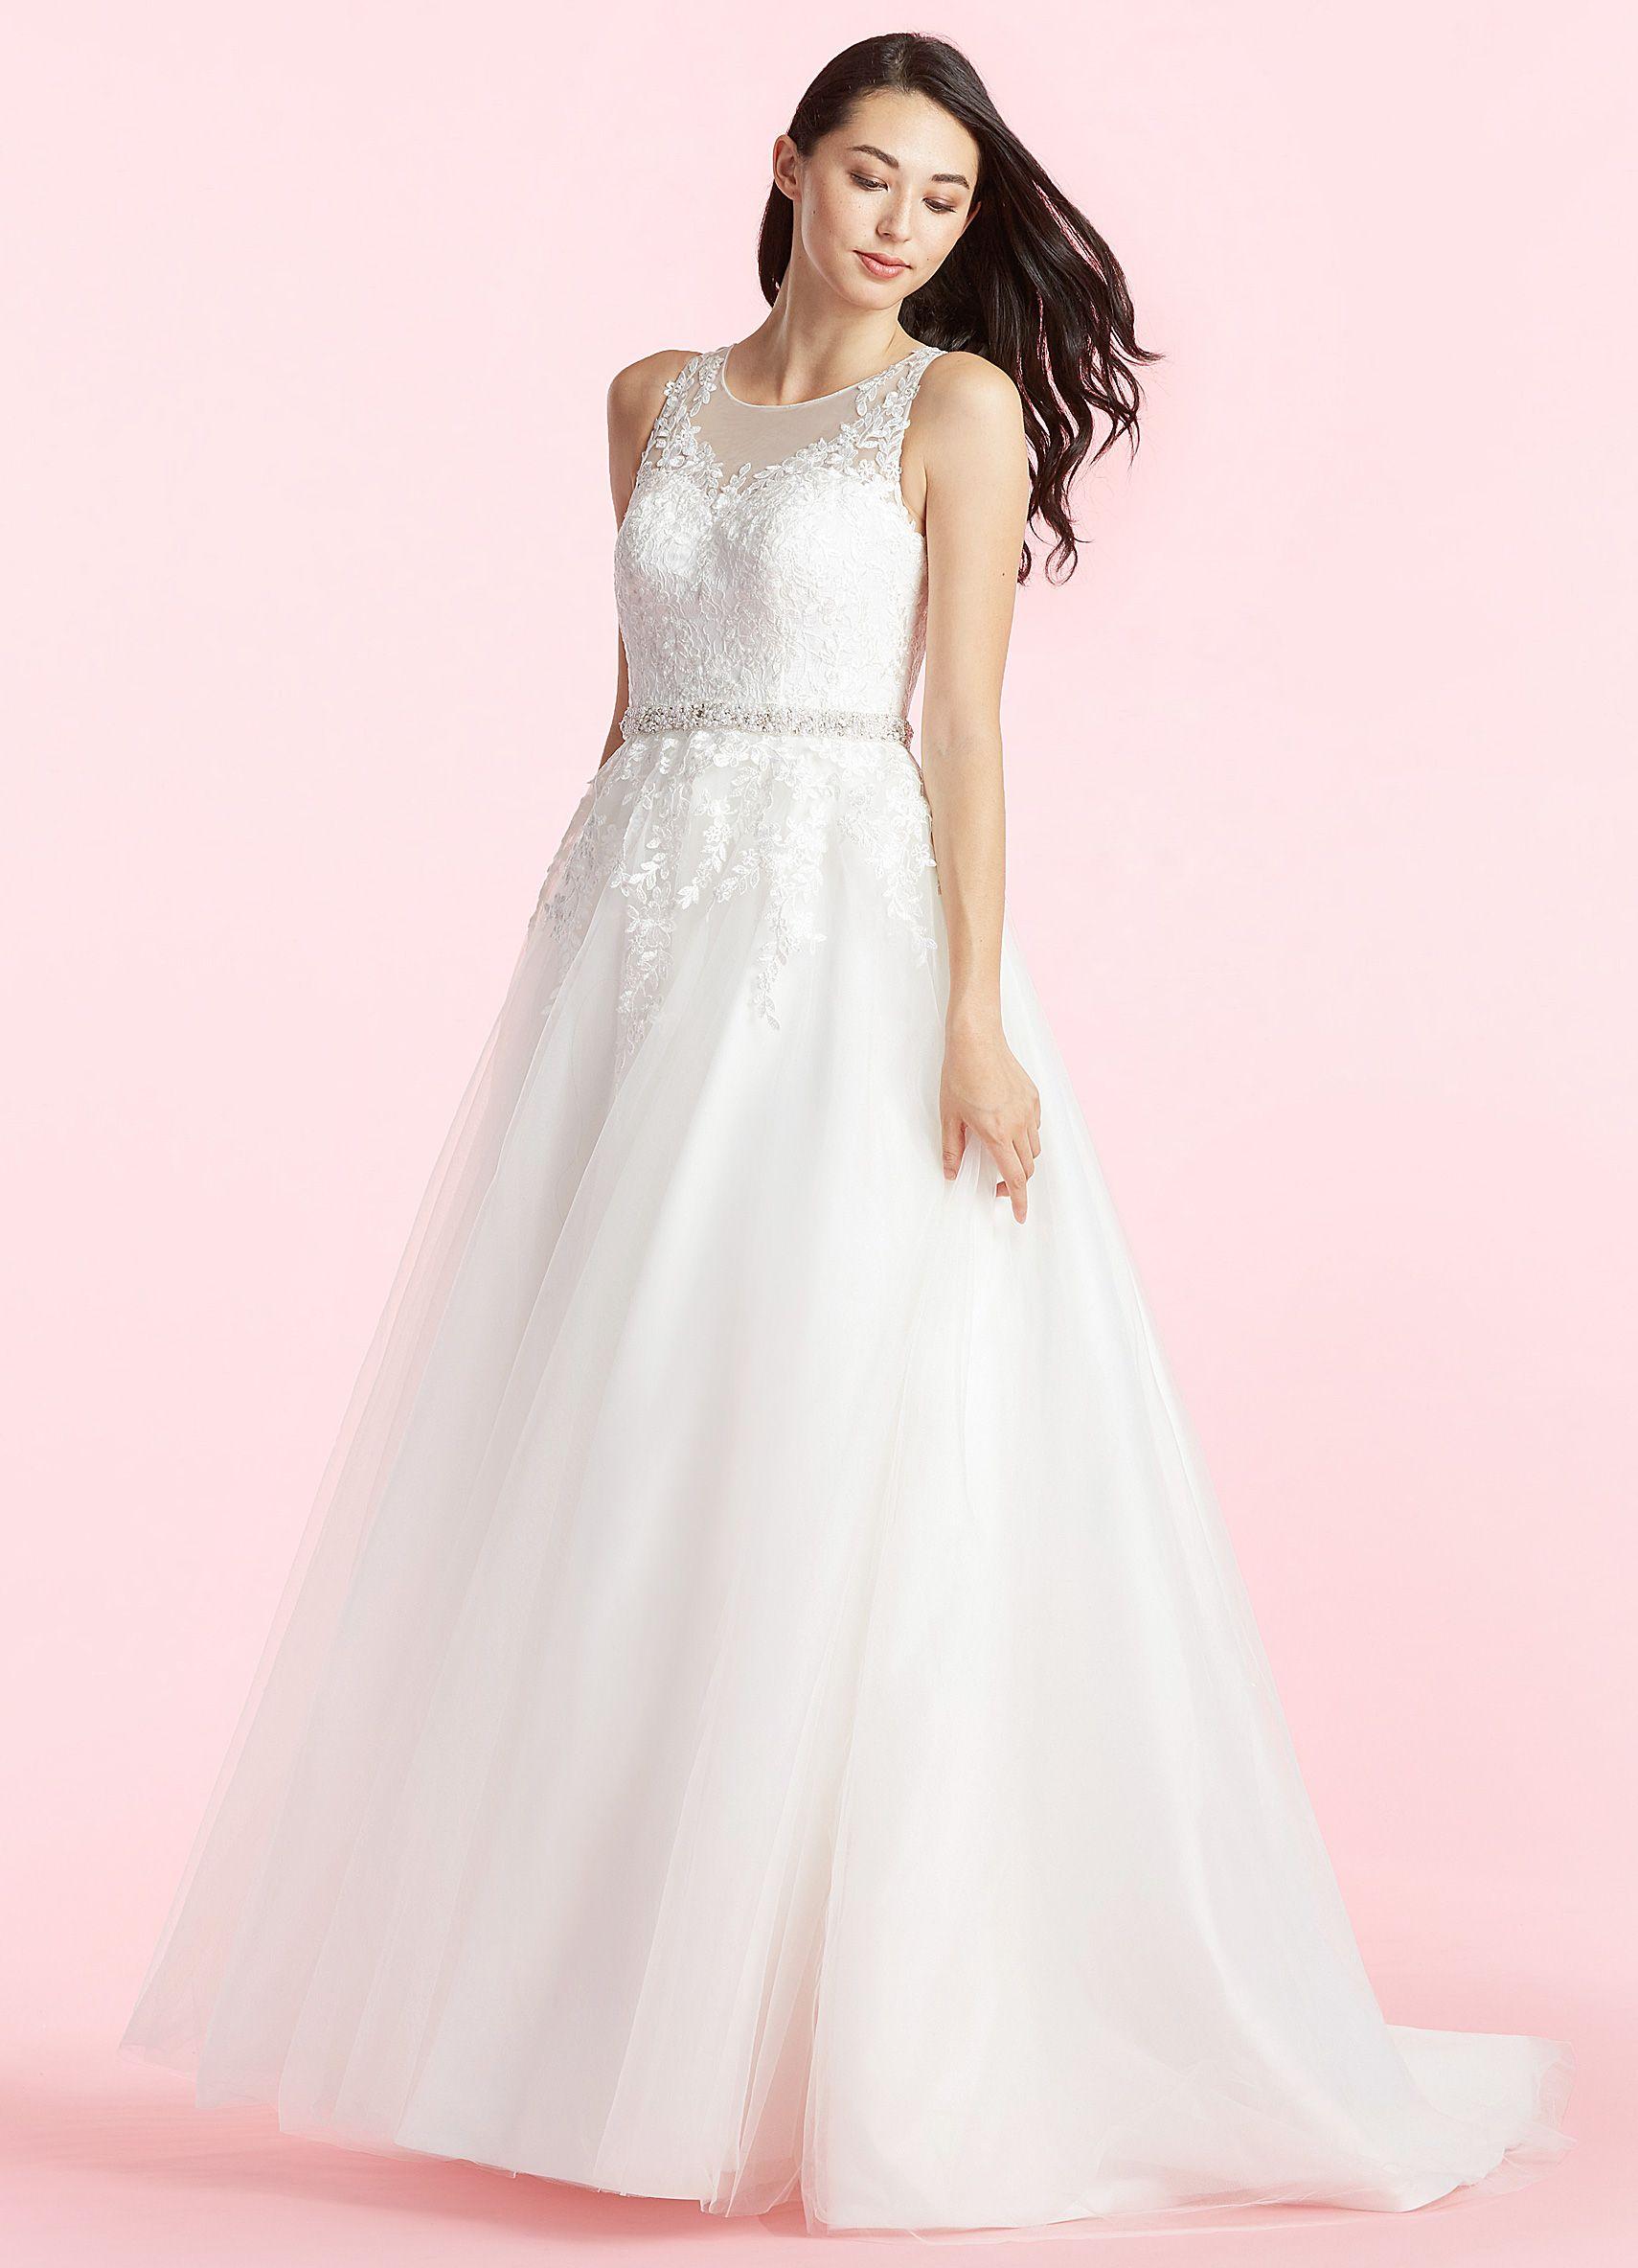 f00b558eb6f AZAZIE 2018 Bridal Collection  Bride  Wedding  Weddingstyle  CustomDresses   AZAZIE